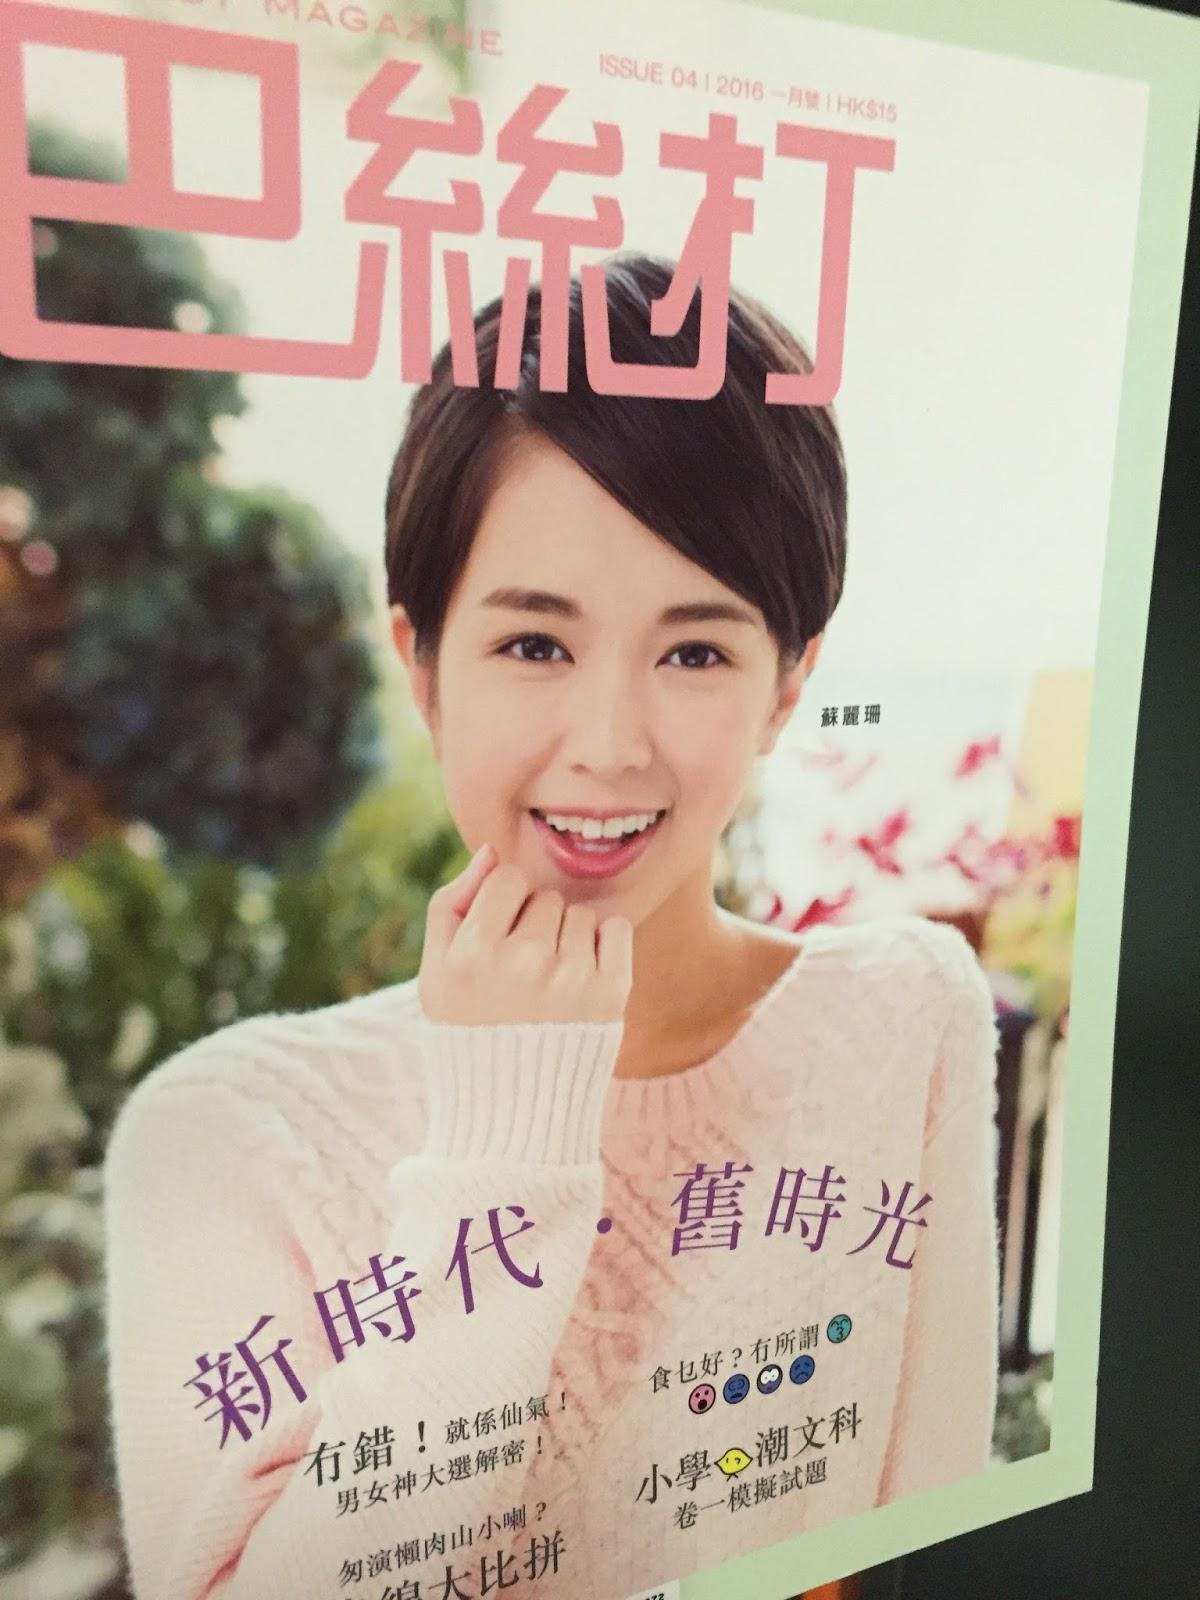 Image result for 堅離地城:沈文 與 光明睇住香港:盧信